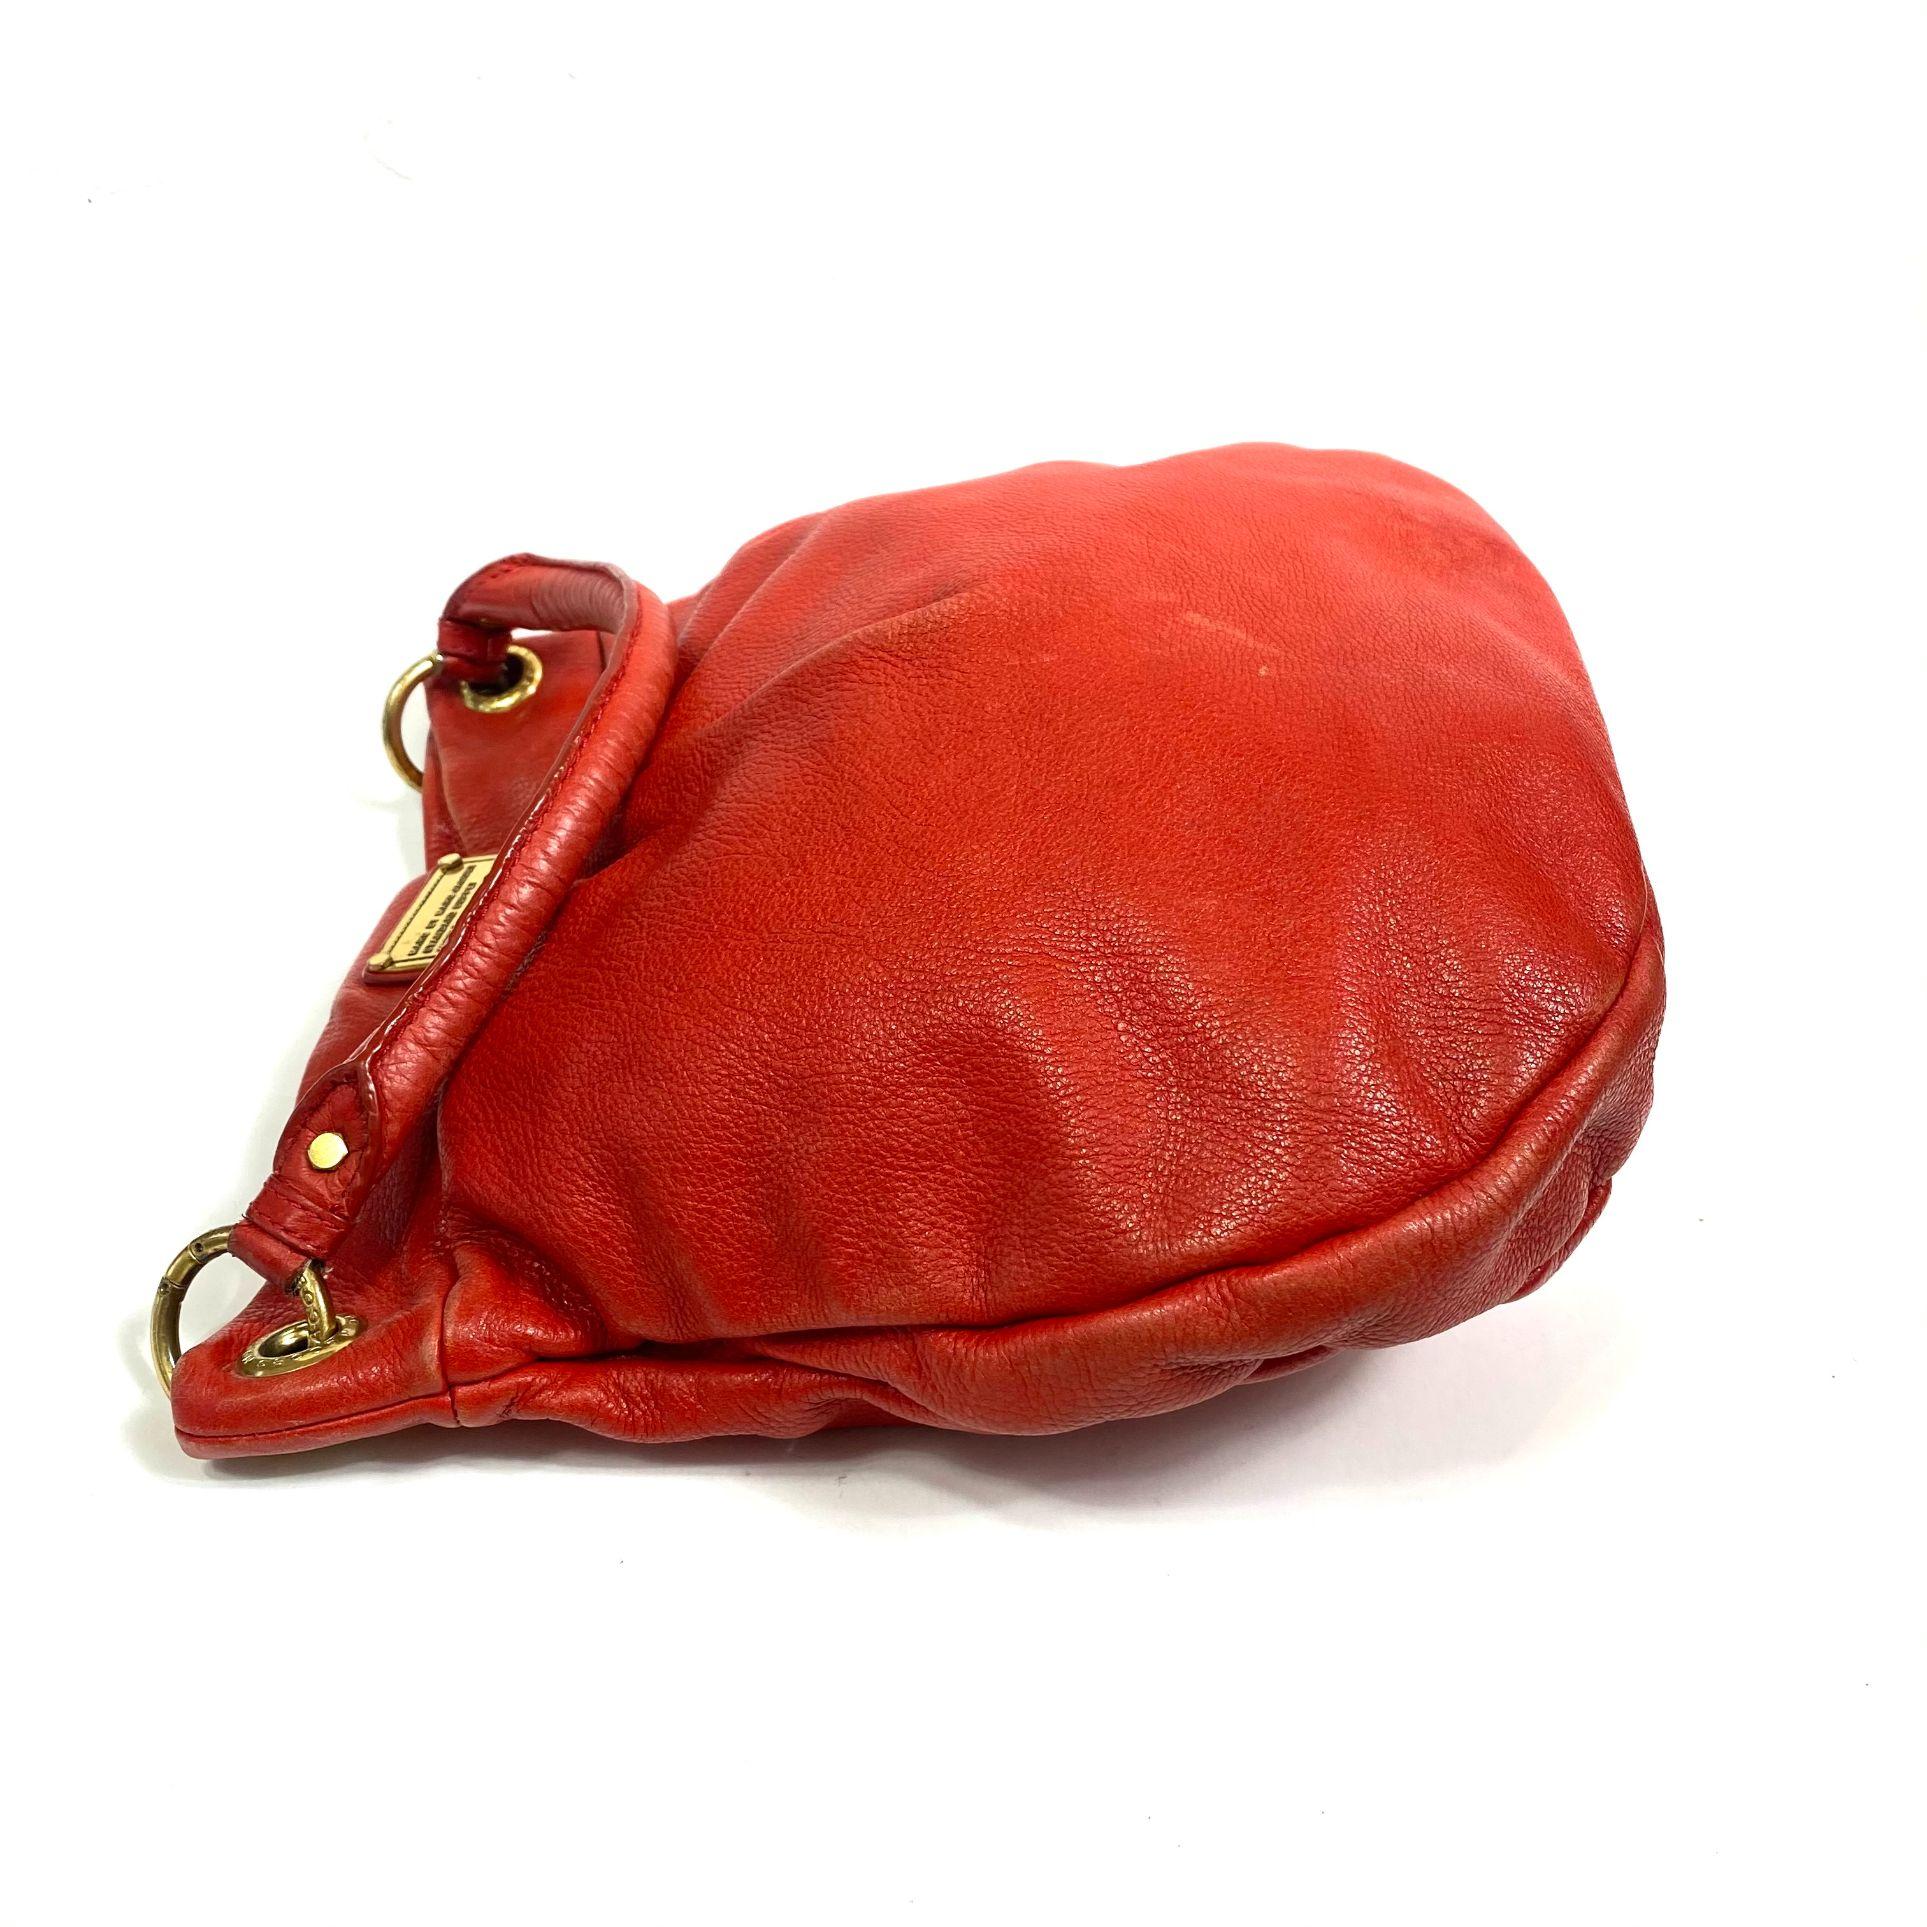 Bolsa Marc Jacobs Hillier Vermelha